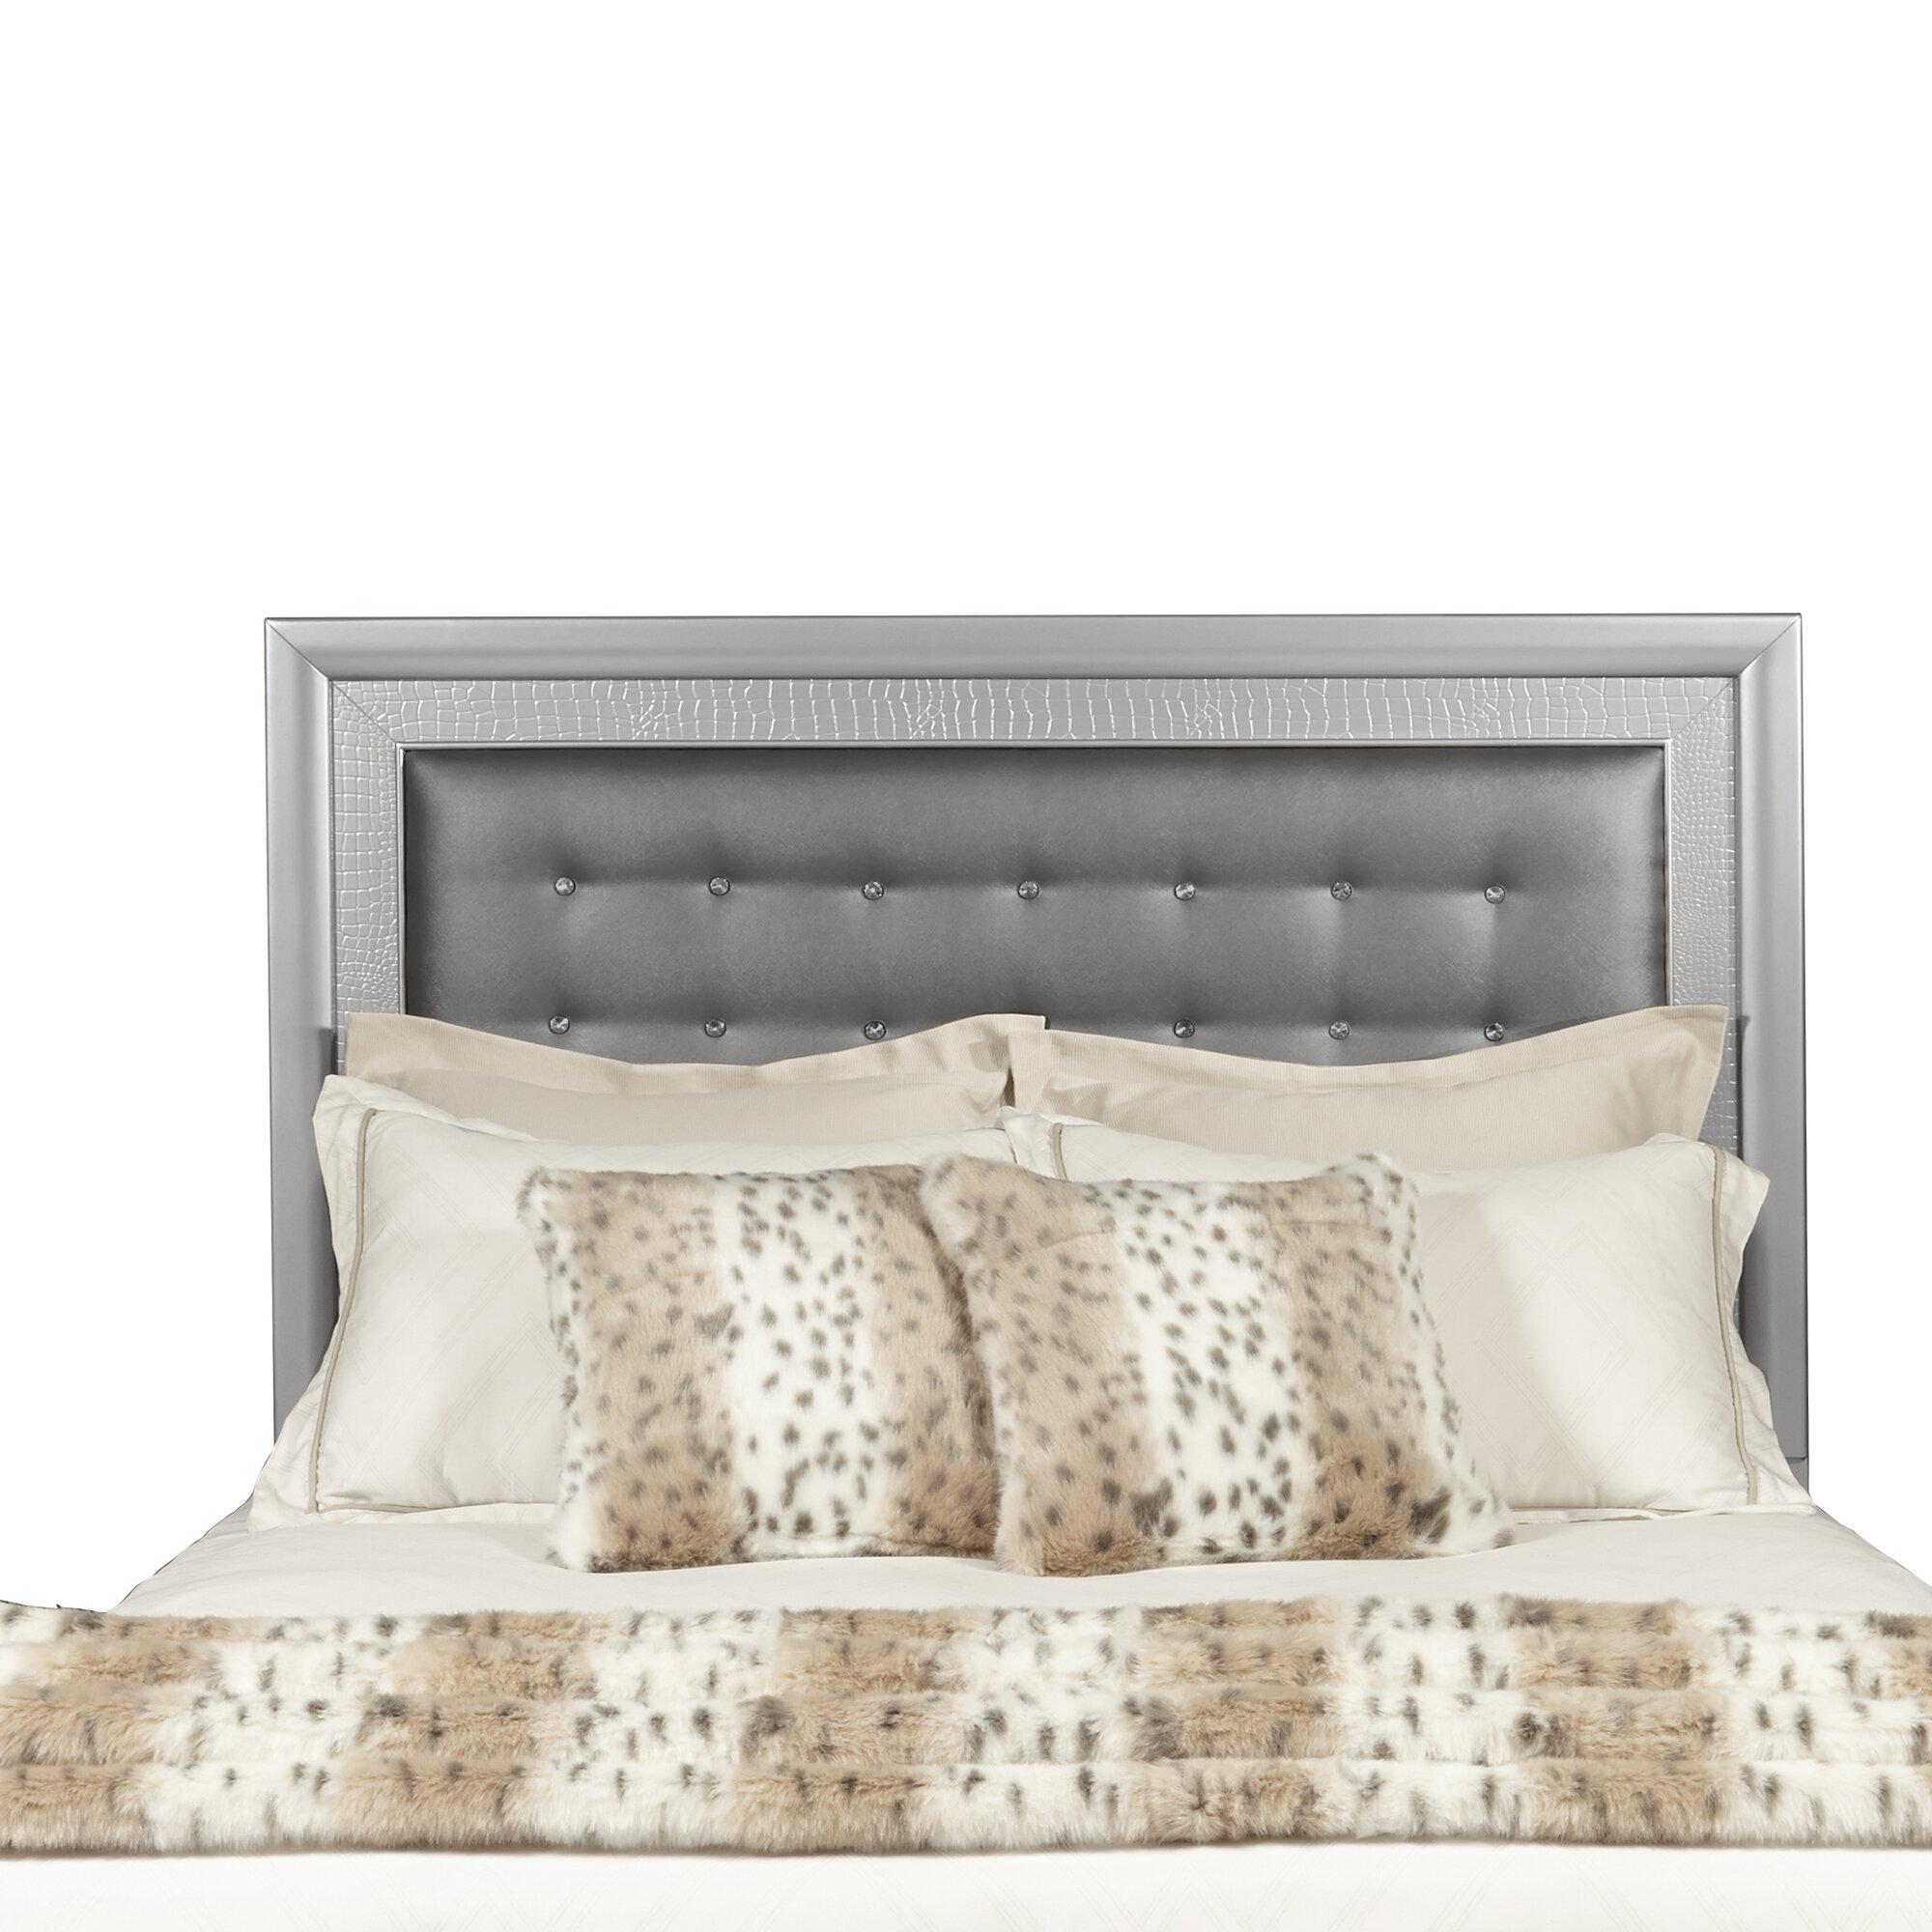 willa arlo interiors brinkworth low profile upholstered